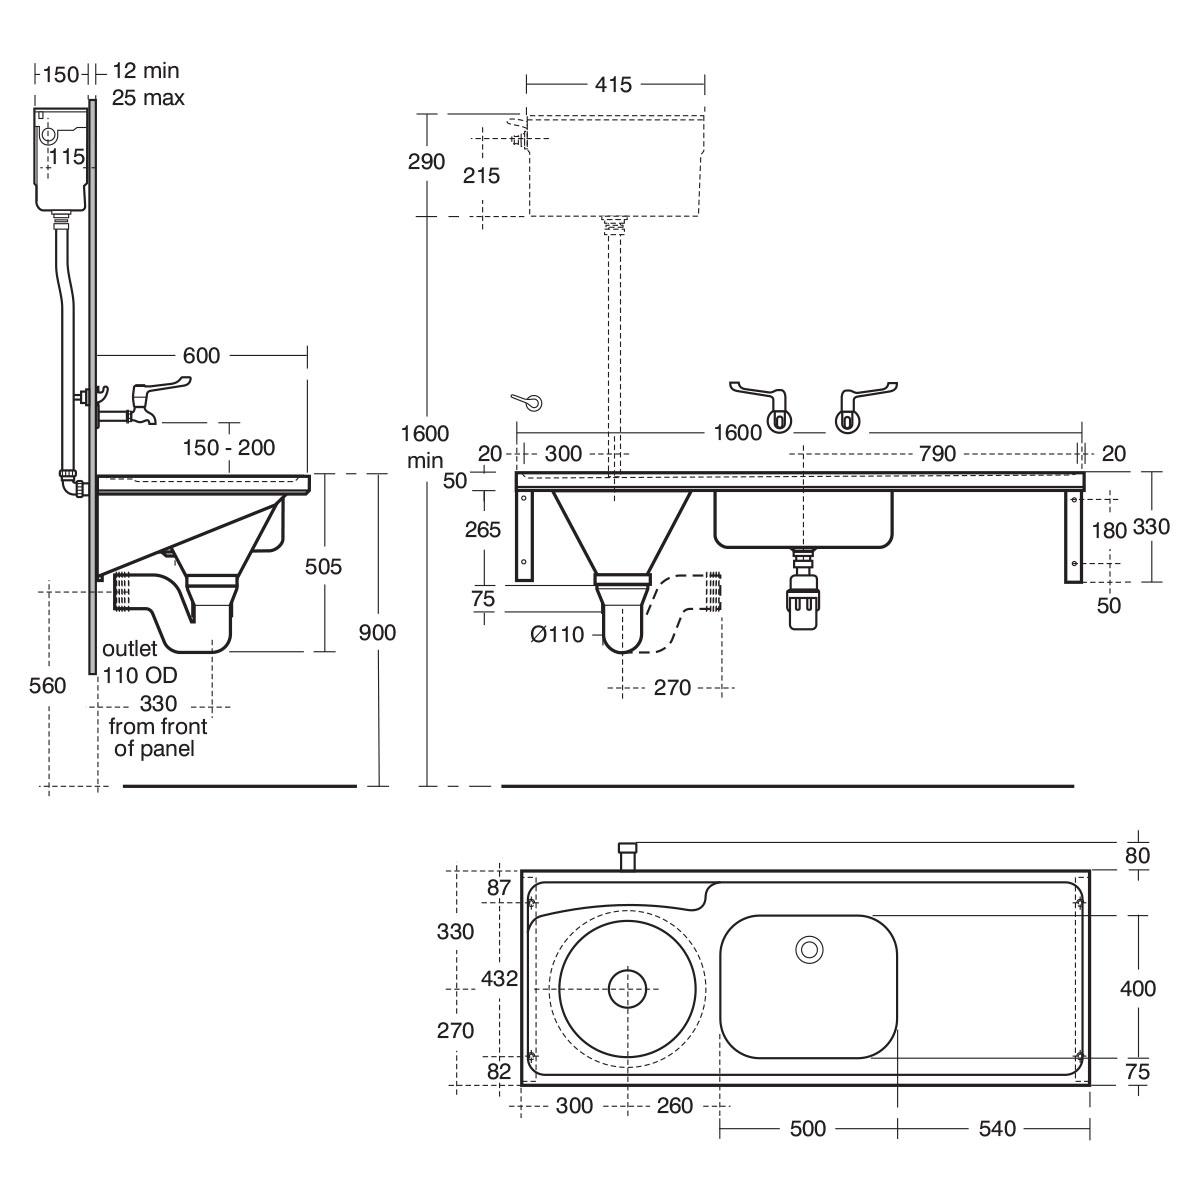 Hbn 00 10 Htm64 Du Hs Dee Back Inlet Slop Hopper Stainless Steel Wiring Diagram For Connector 1450 Download